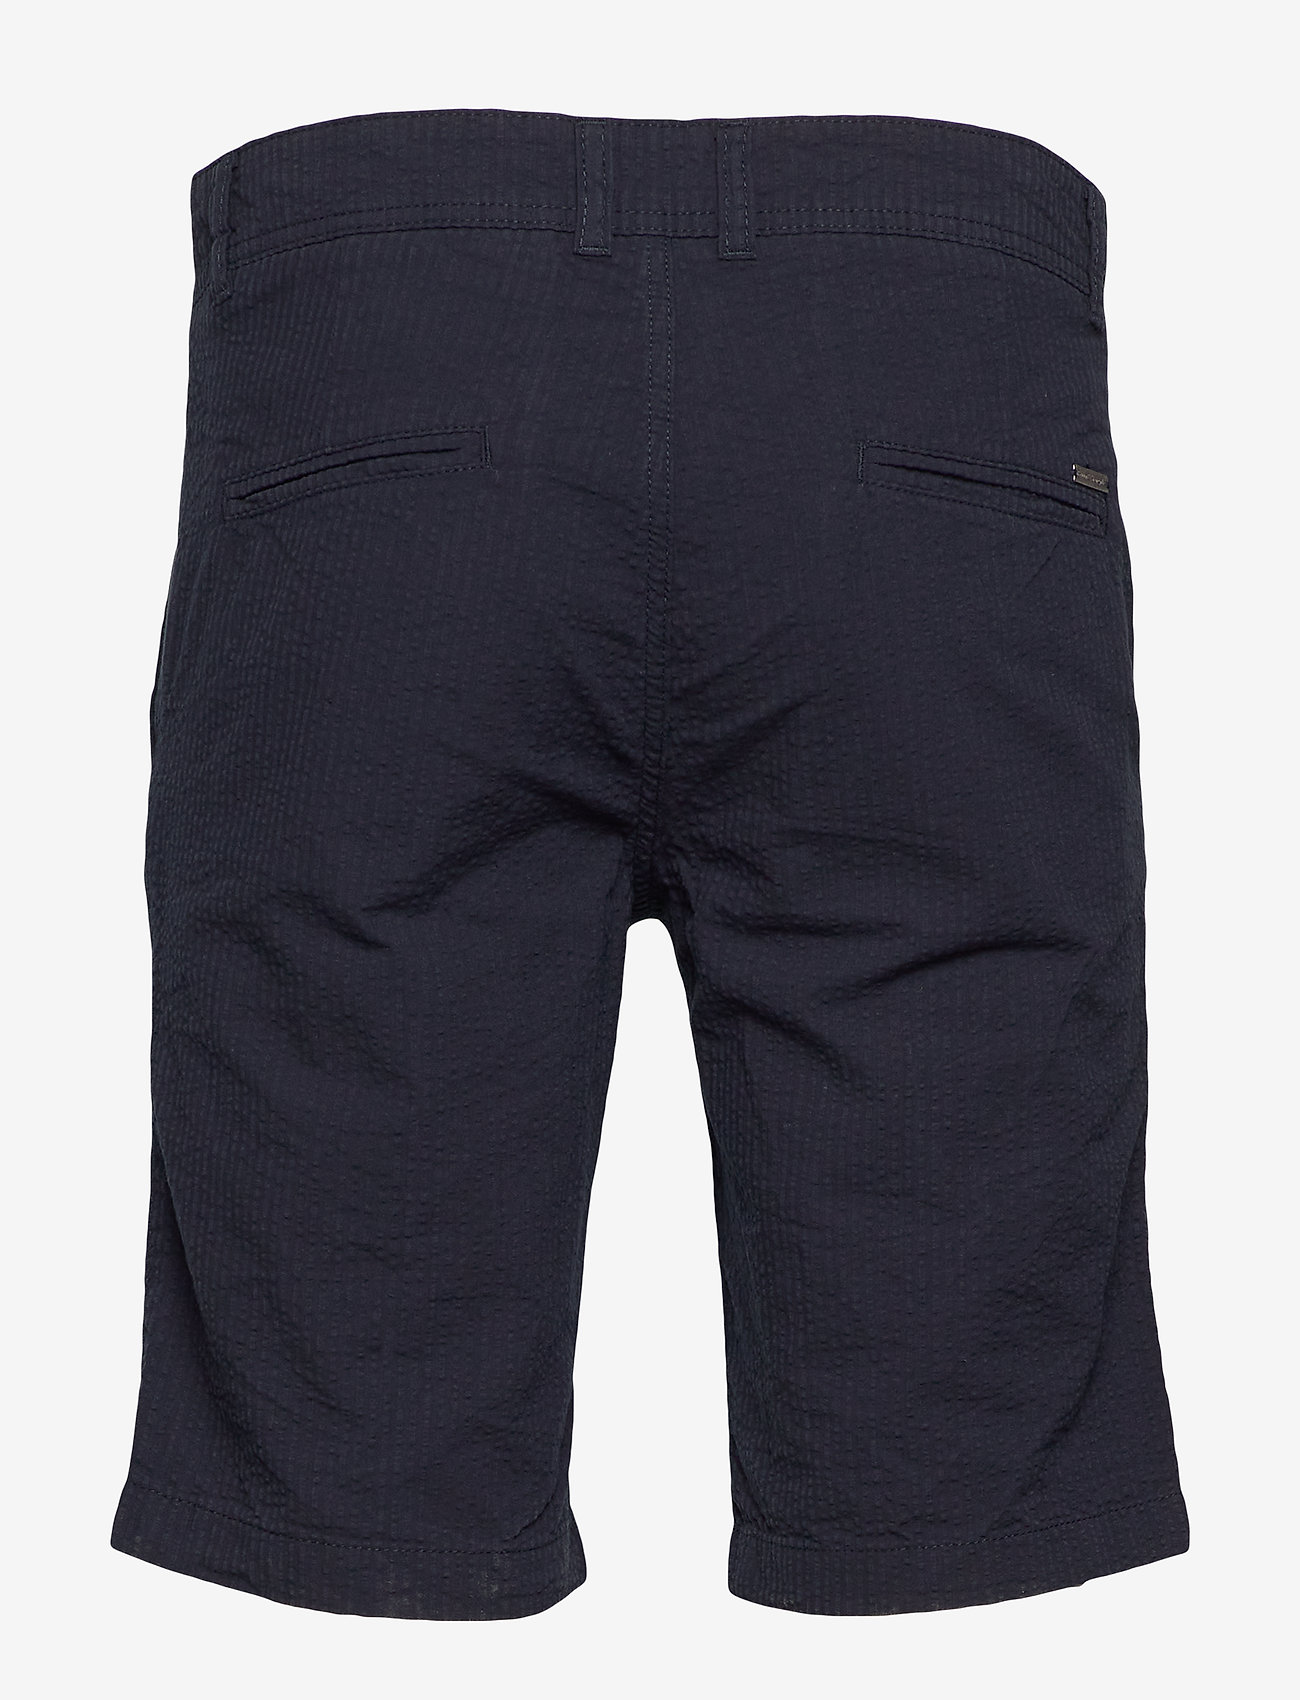 Bs Tulum Slim (Navy) (32.47 €) - Bruun & Stengade iGfDk